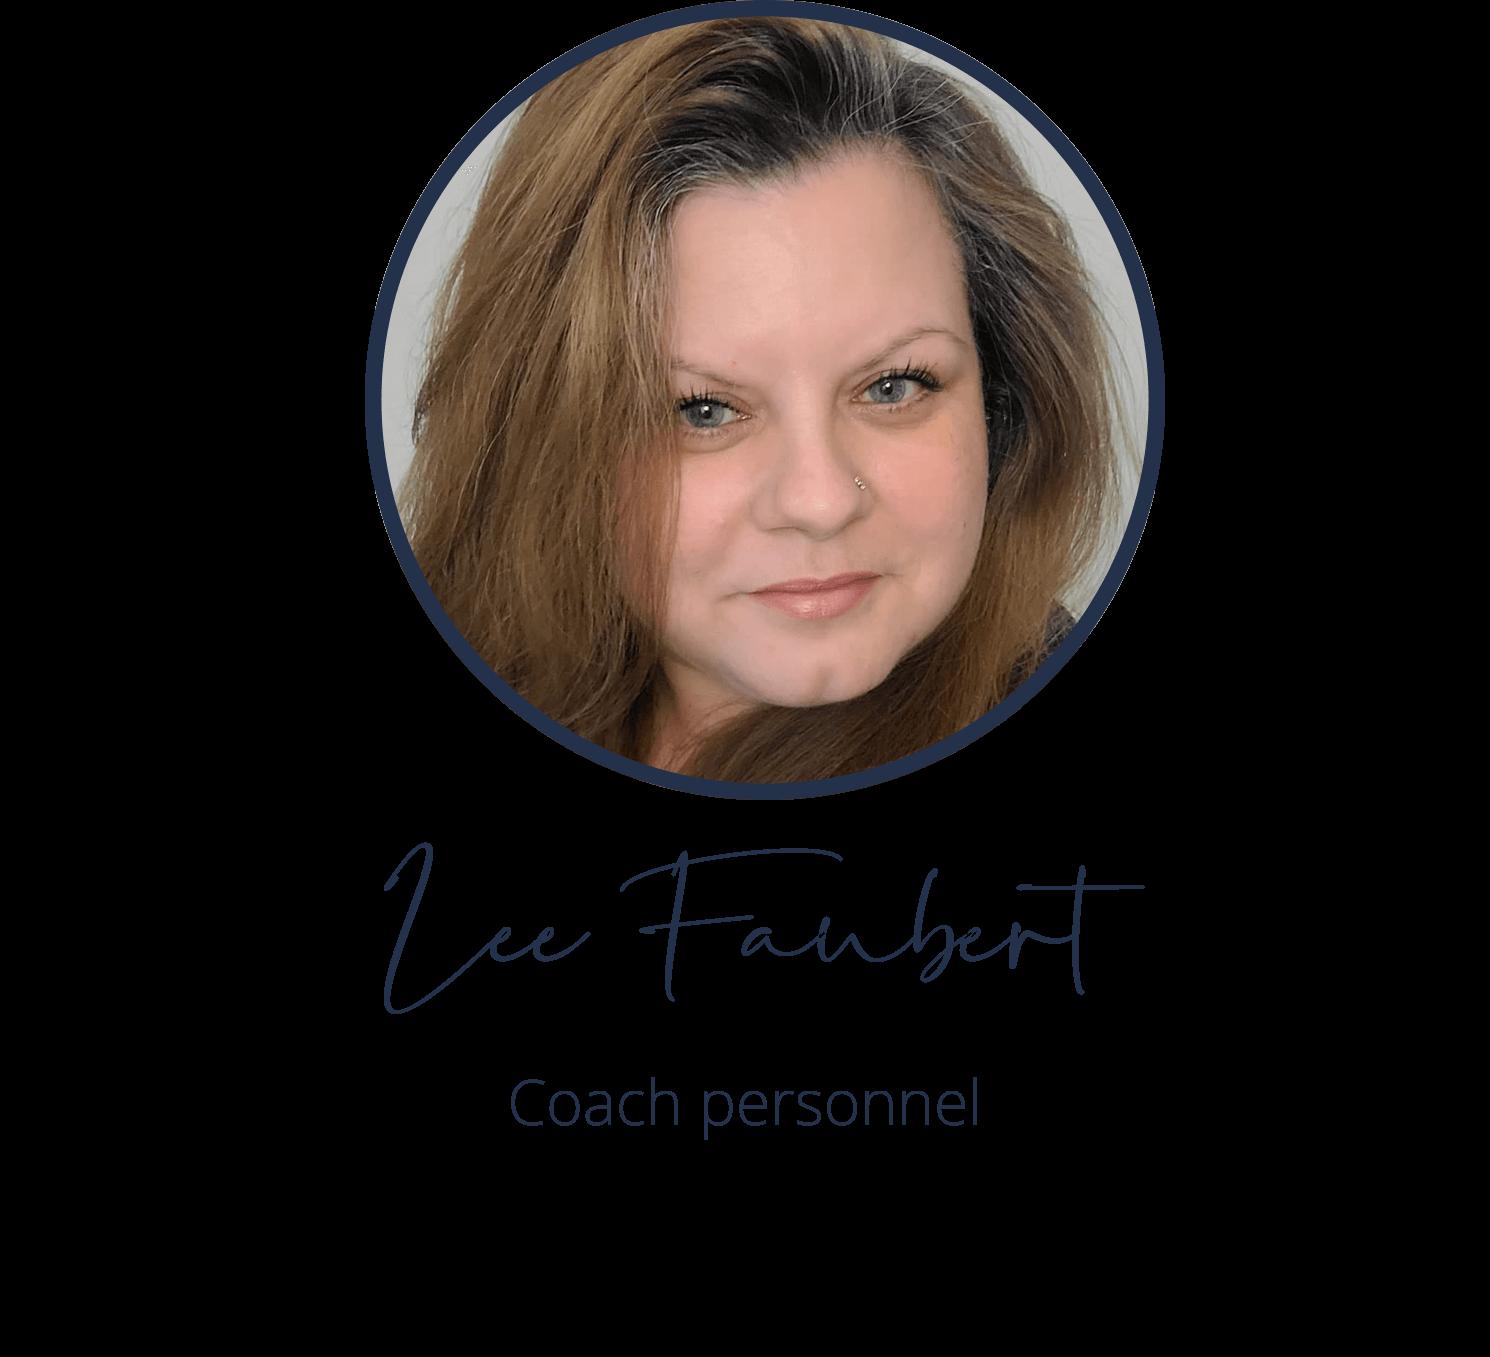 Lee Faubert, Coach personnel